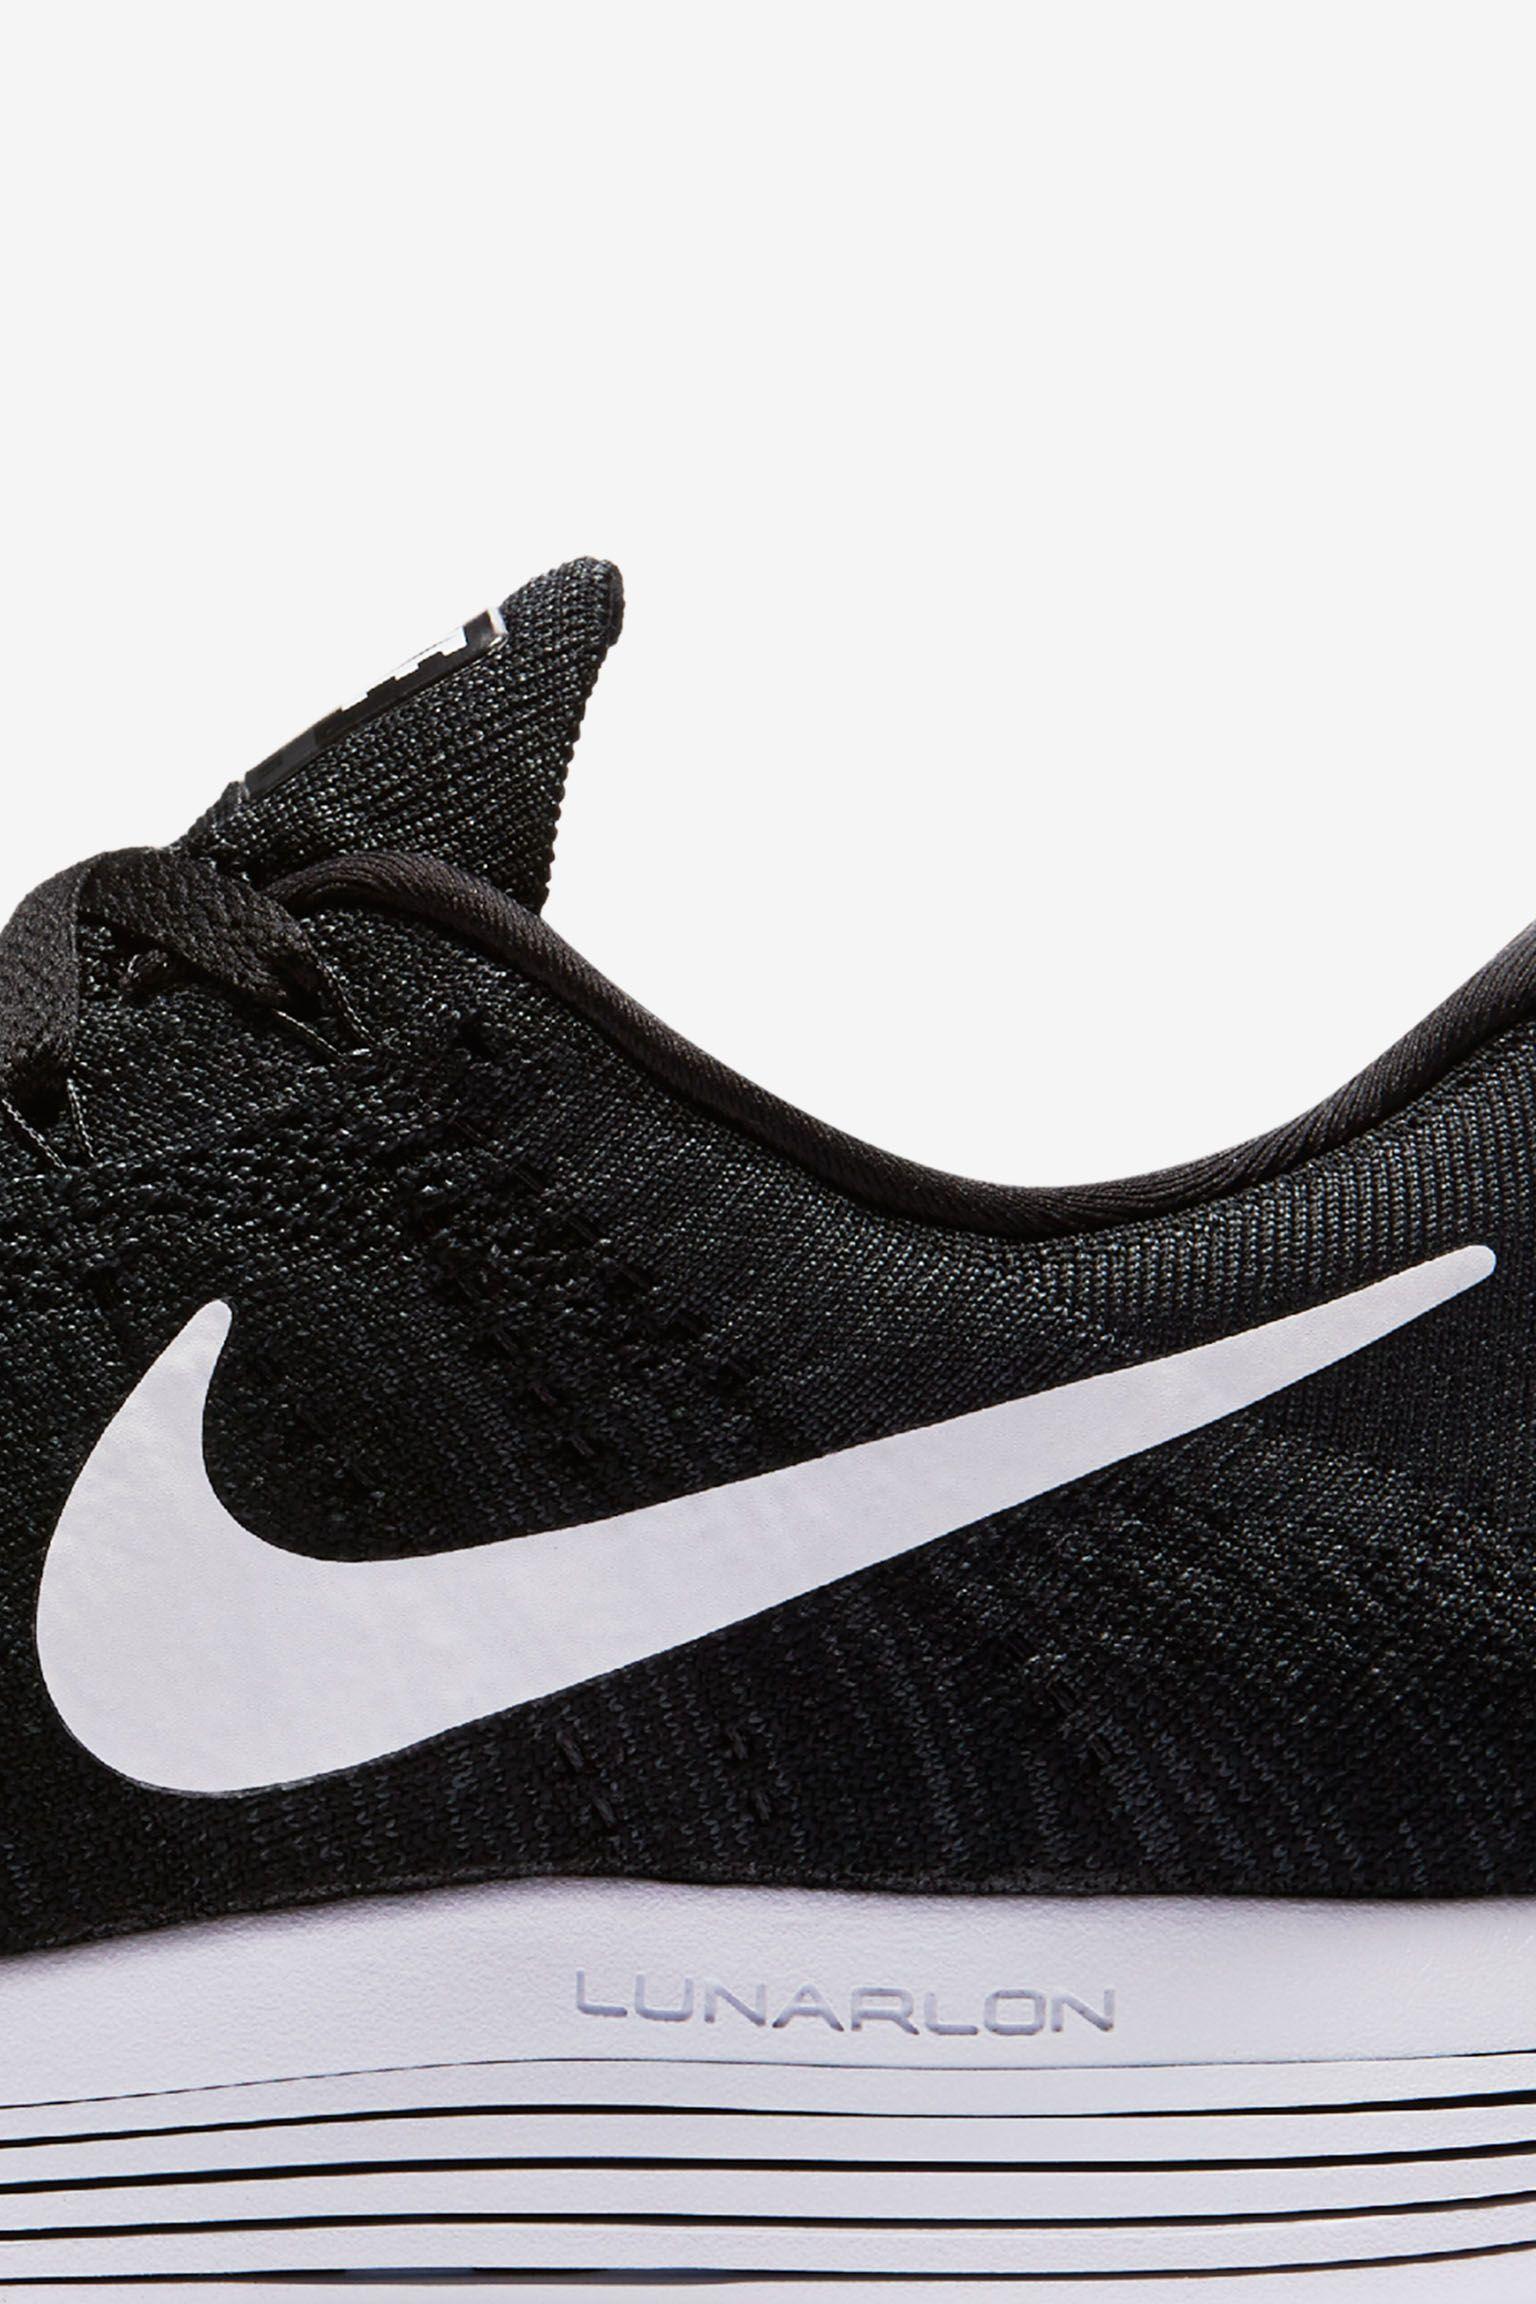 Nike LunarEpic Low Flyknit 'Future of Running'